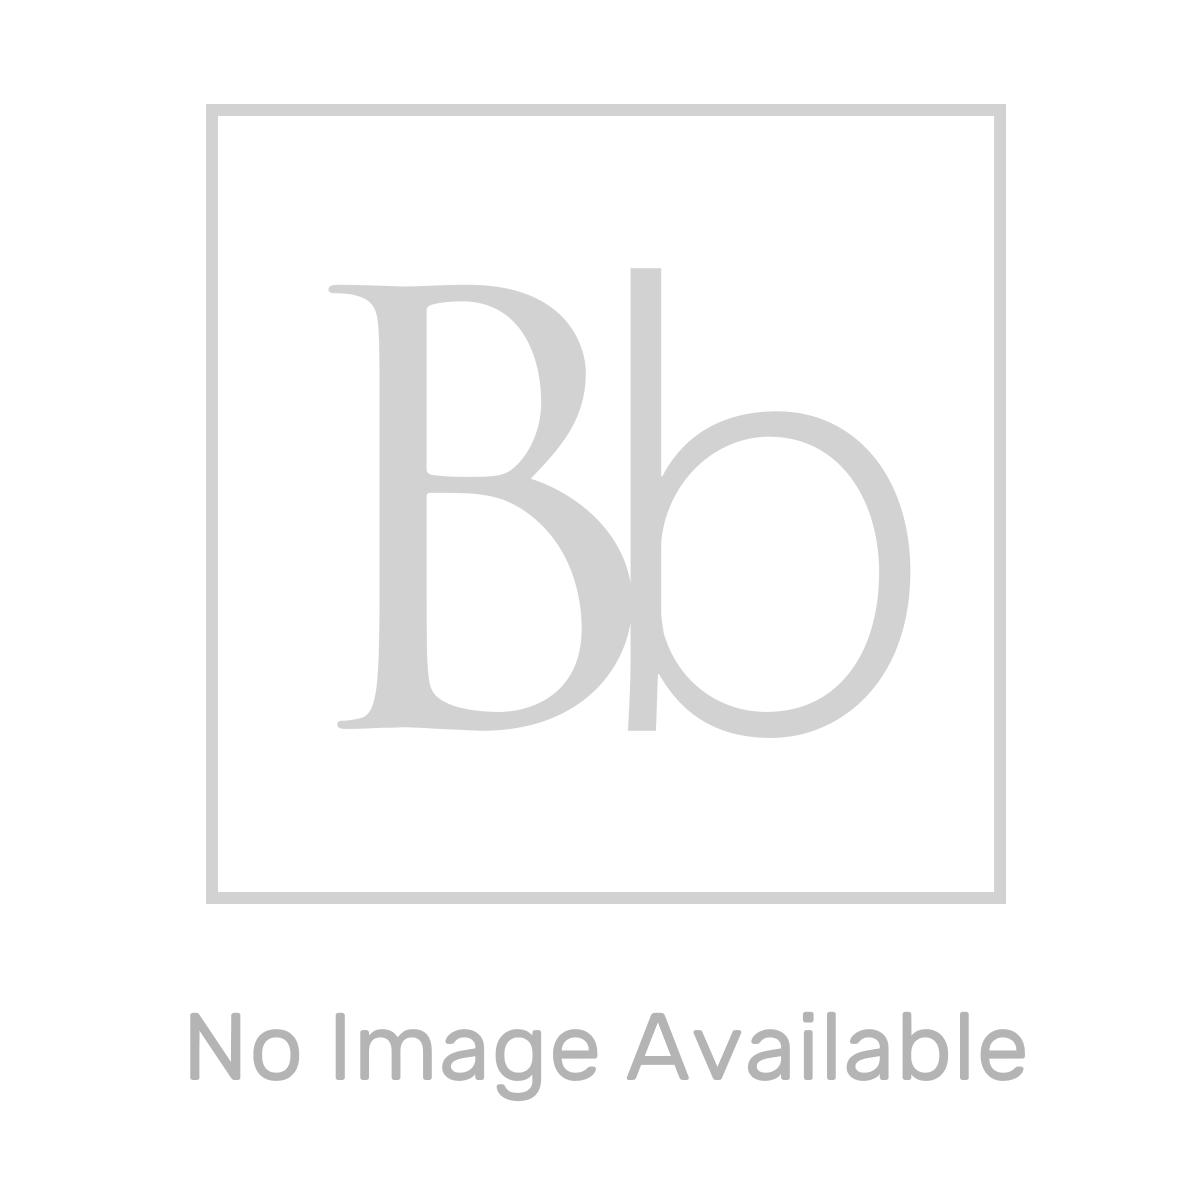 Nuie Athena Grey Avola 2 Door Wall Hung Vanity Unit with 18mm Worktop 500mm Line Drawing